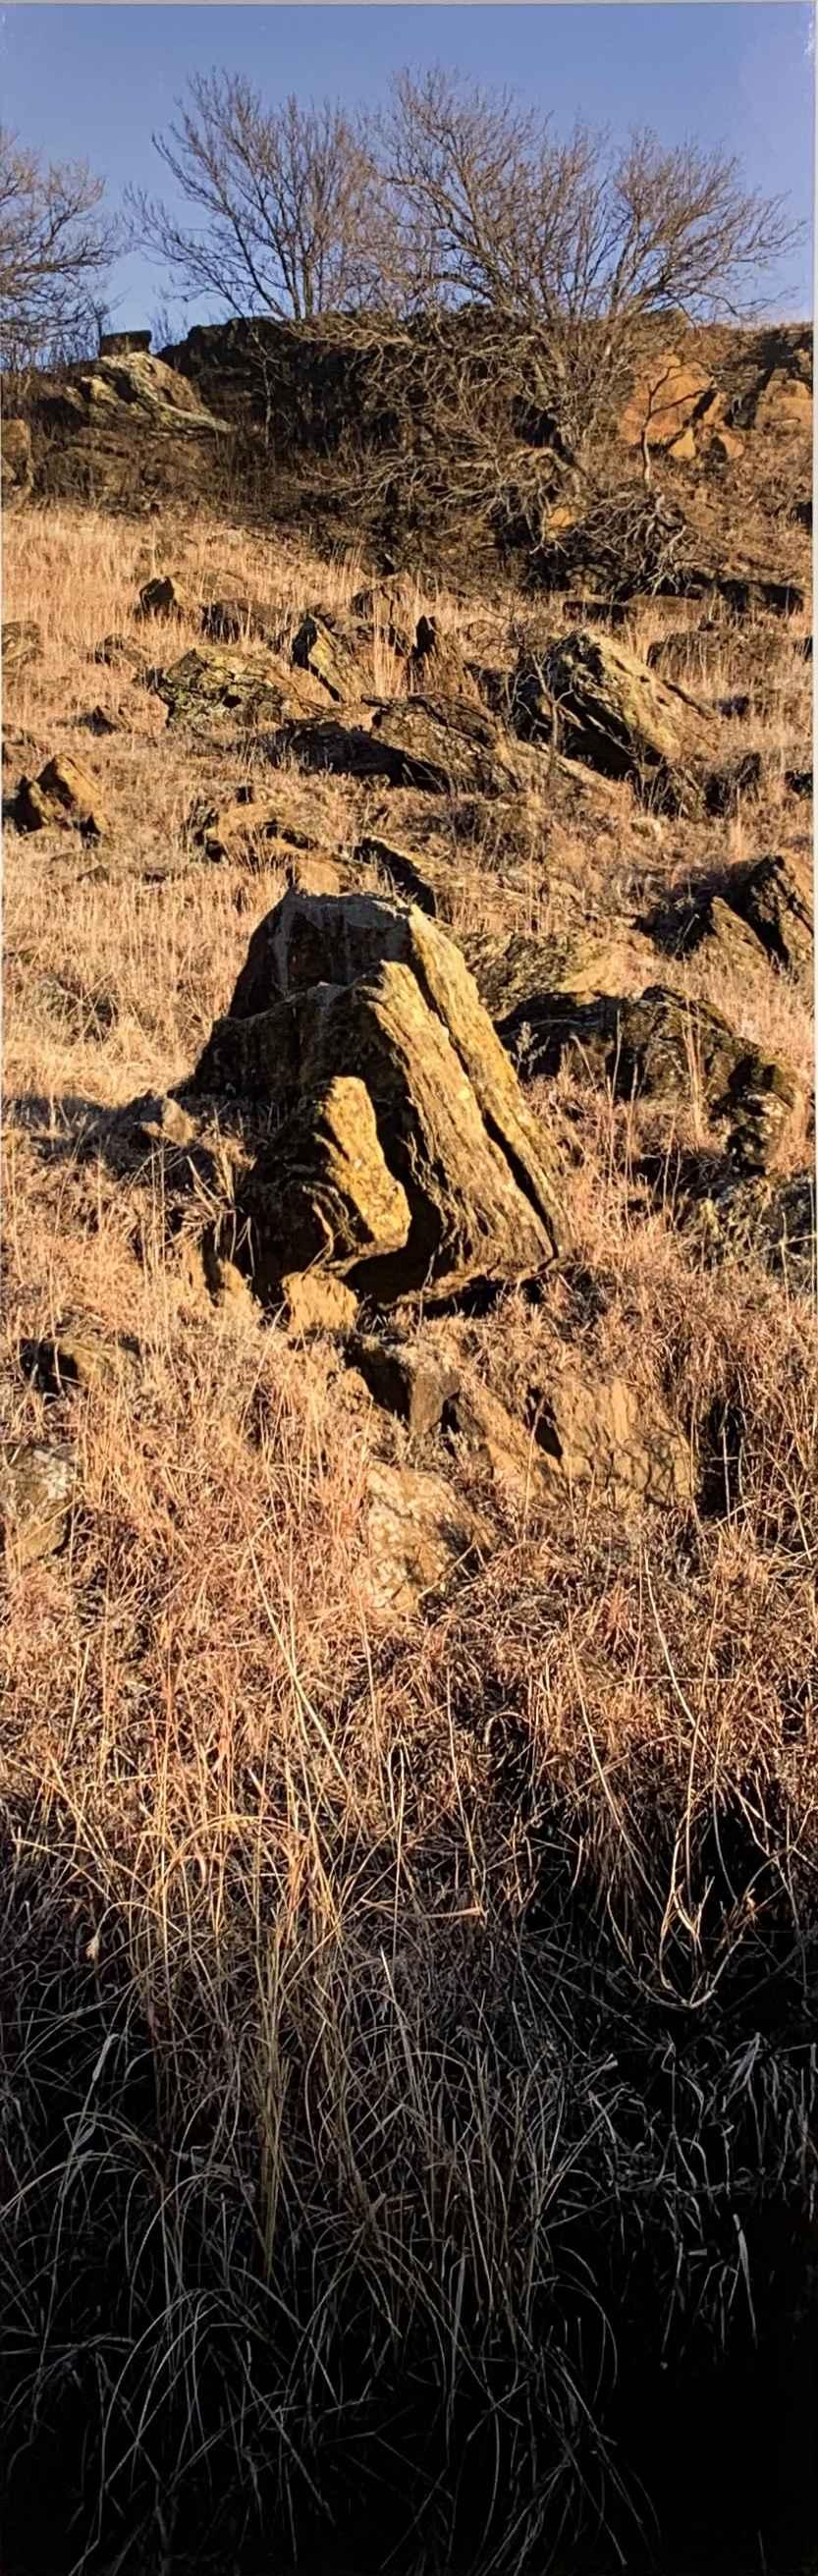 Grasses, Stones, Tree... by  George Jerkovich - Masterpiece Online